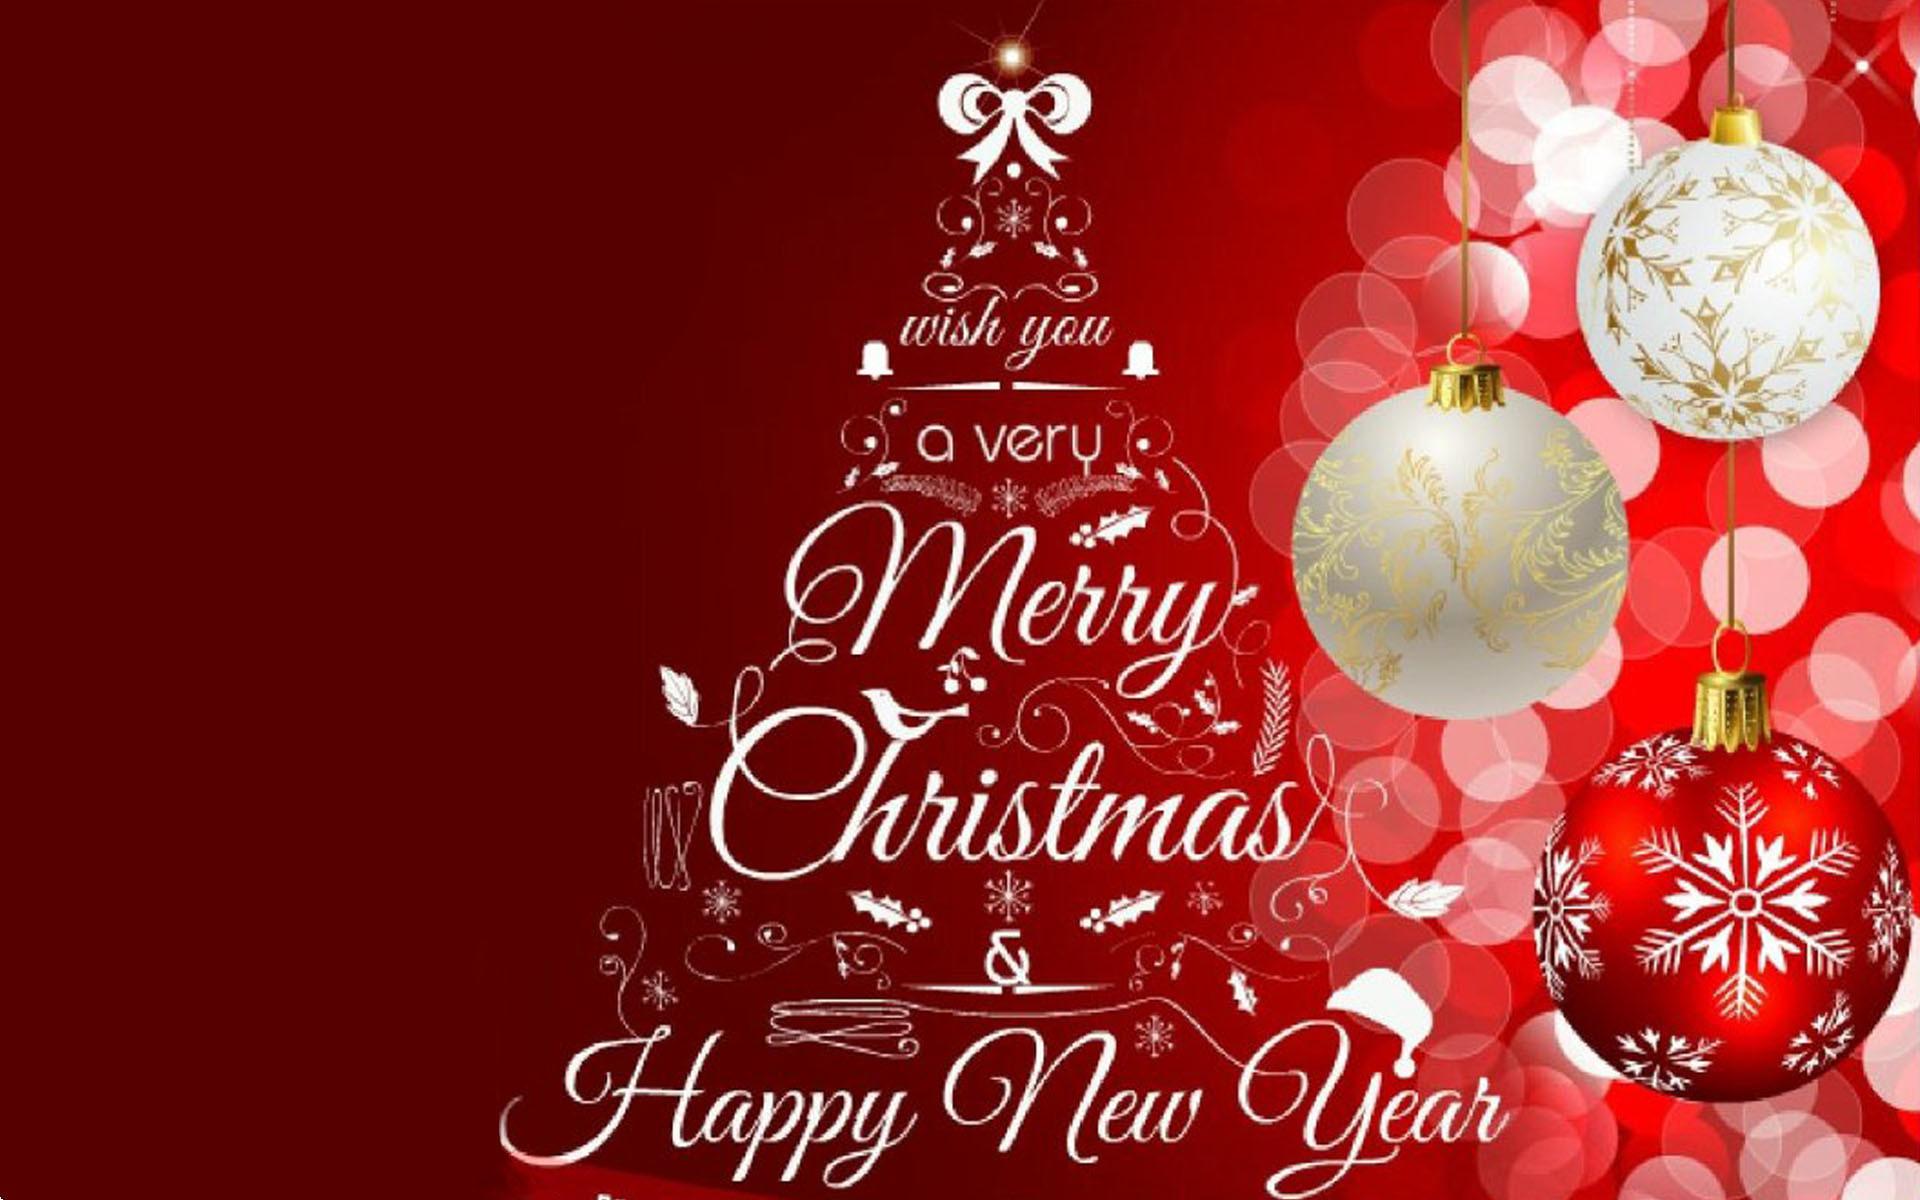 Happy Holidays Greetings Sample